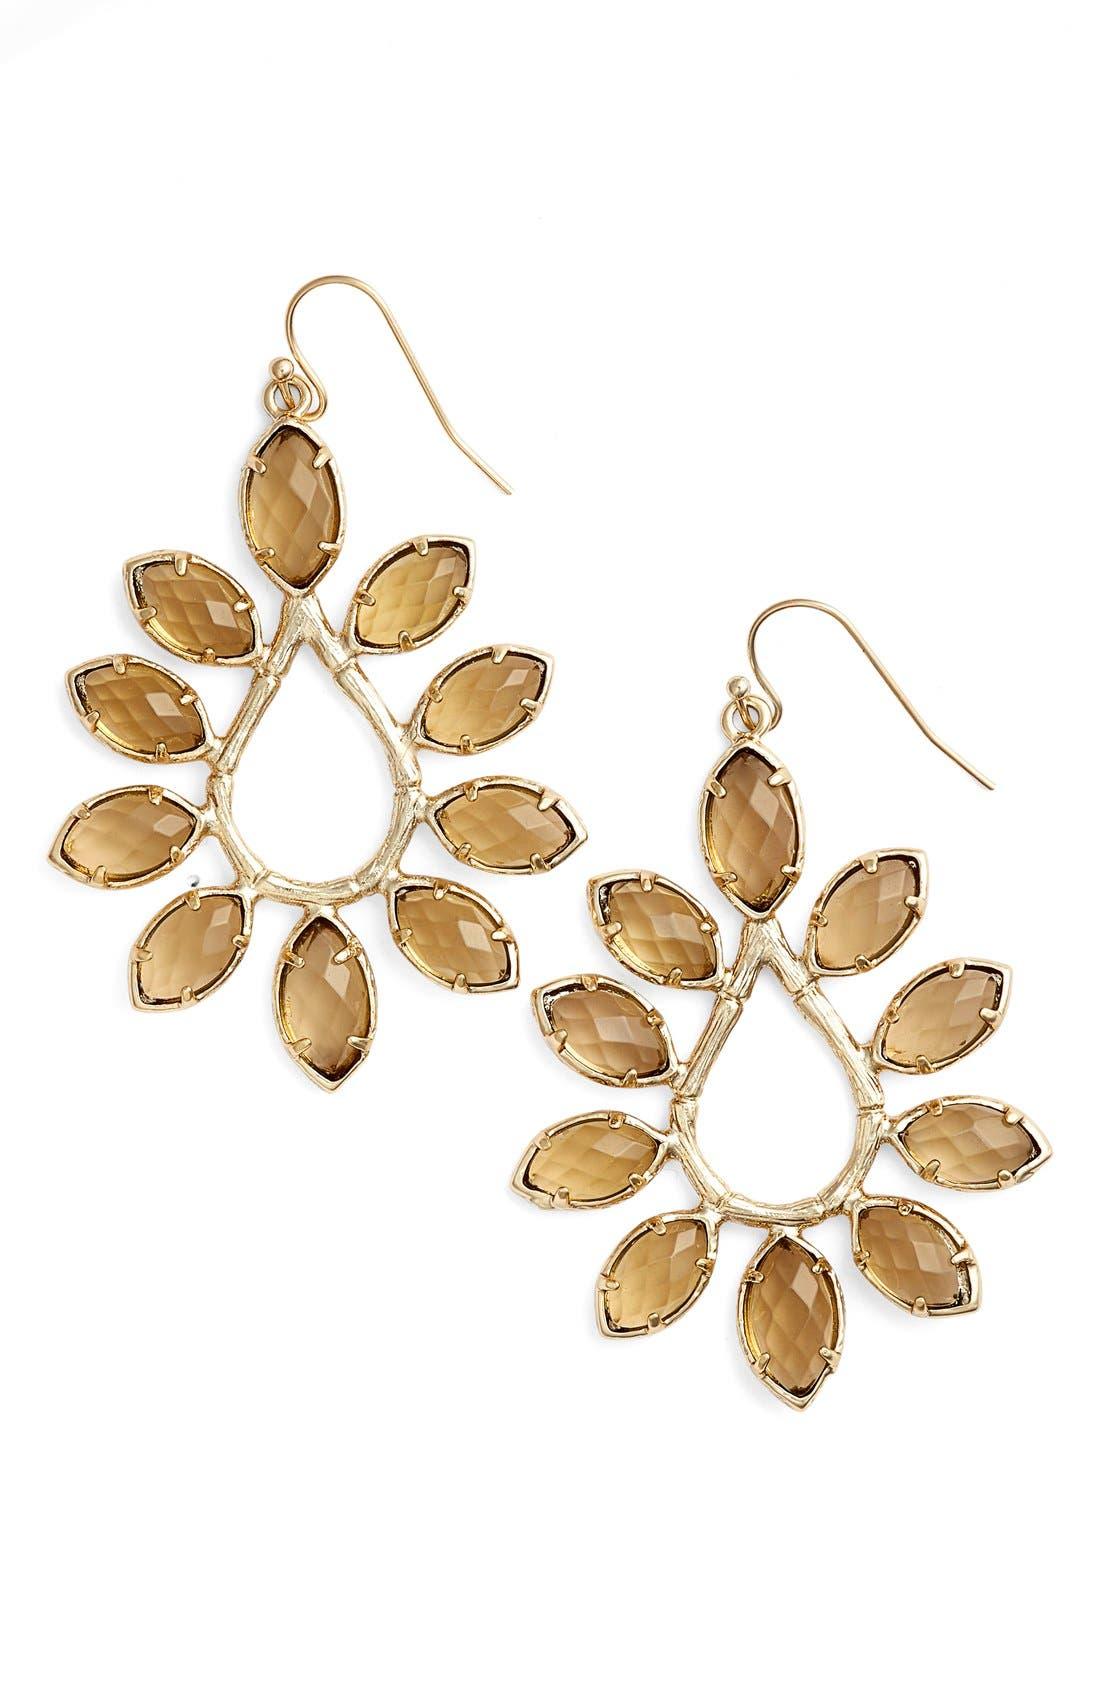 Alternate Image 1 Selected - Kendra Scott 'Nyla' Large Teardrop Floral Earrings